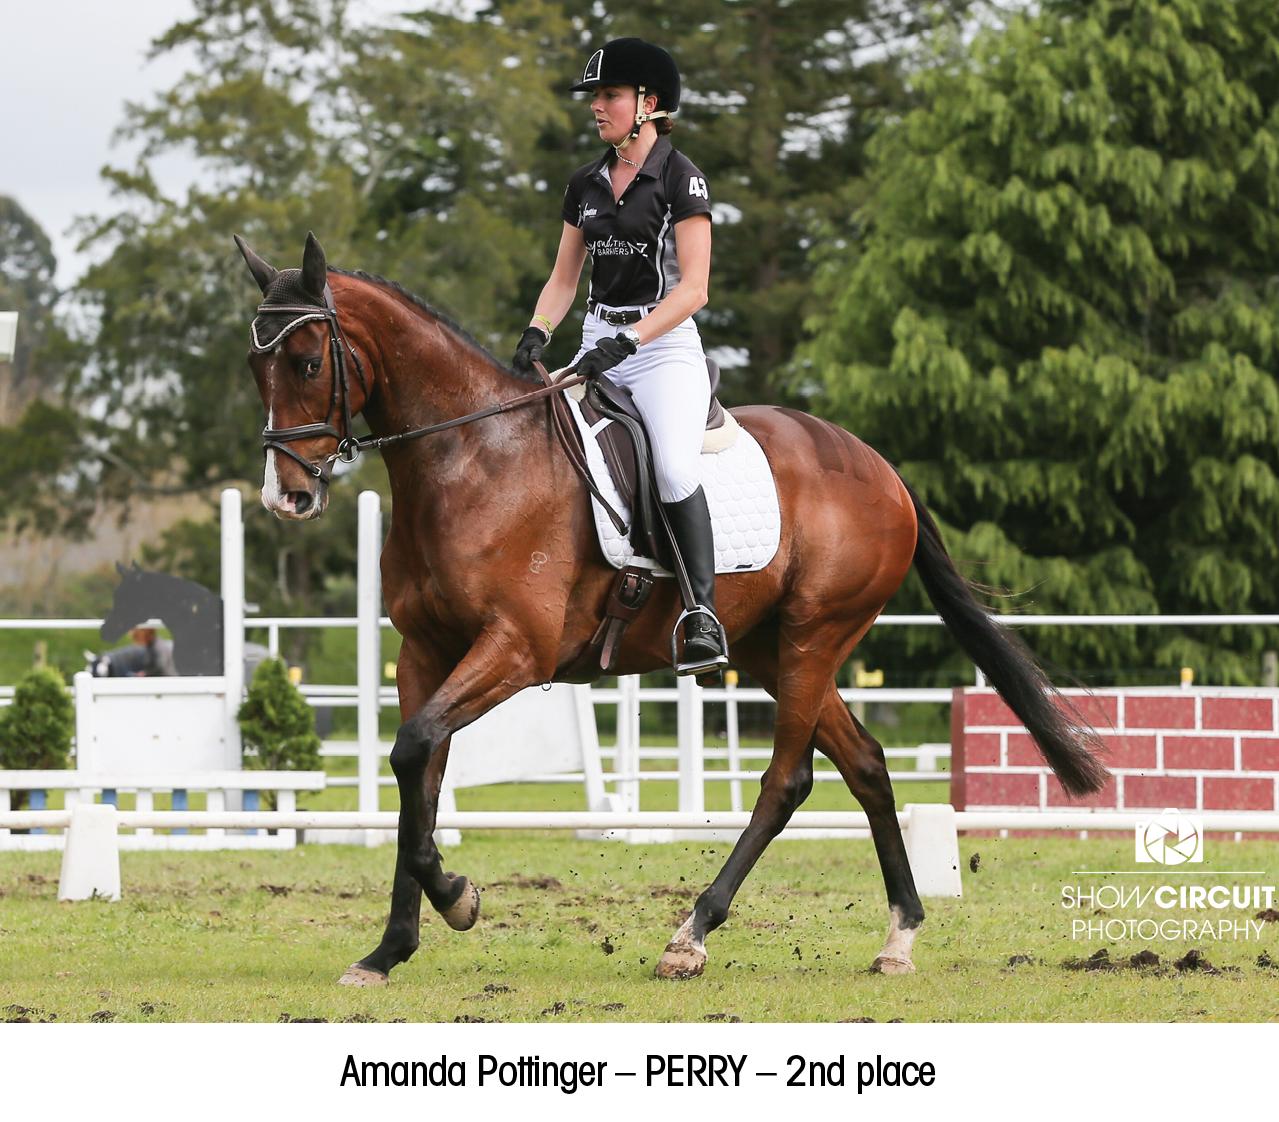 Amanda_Pottinger_–_PERRY_–_2nd_place